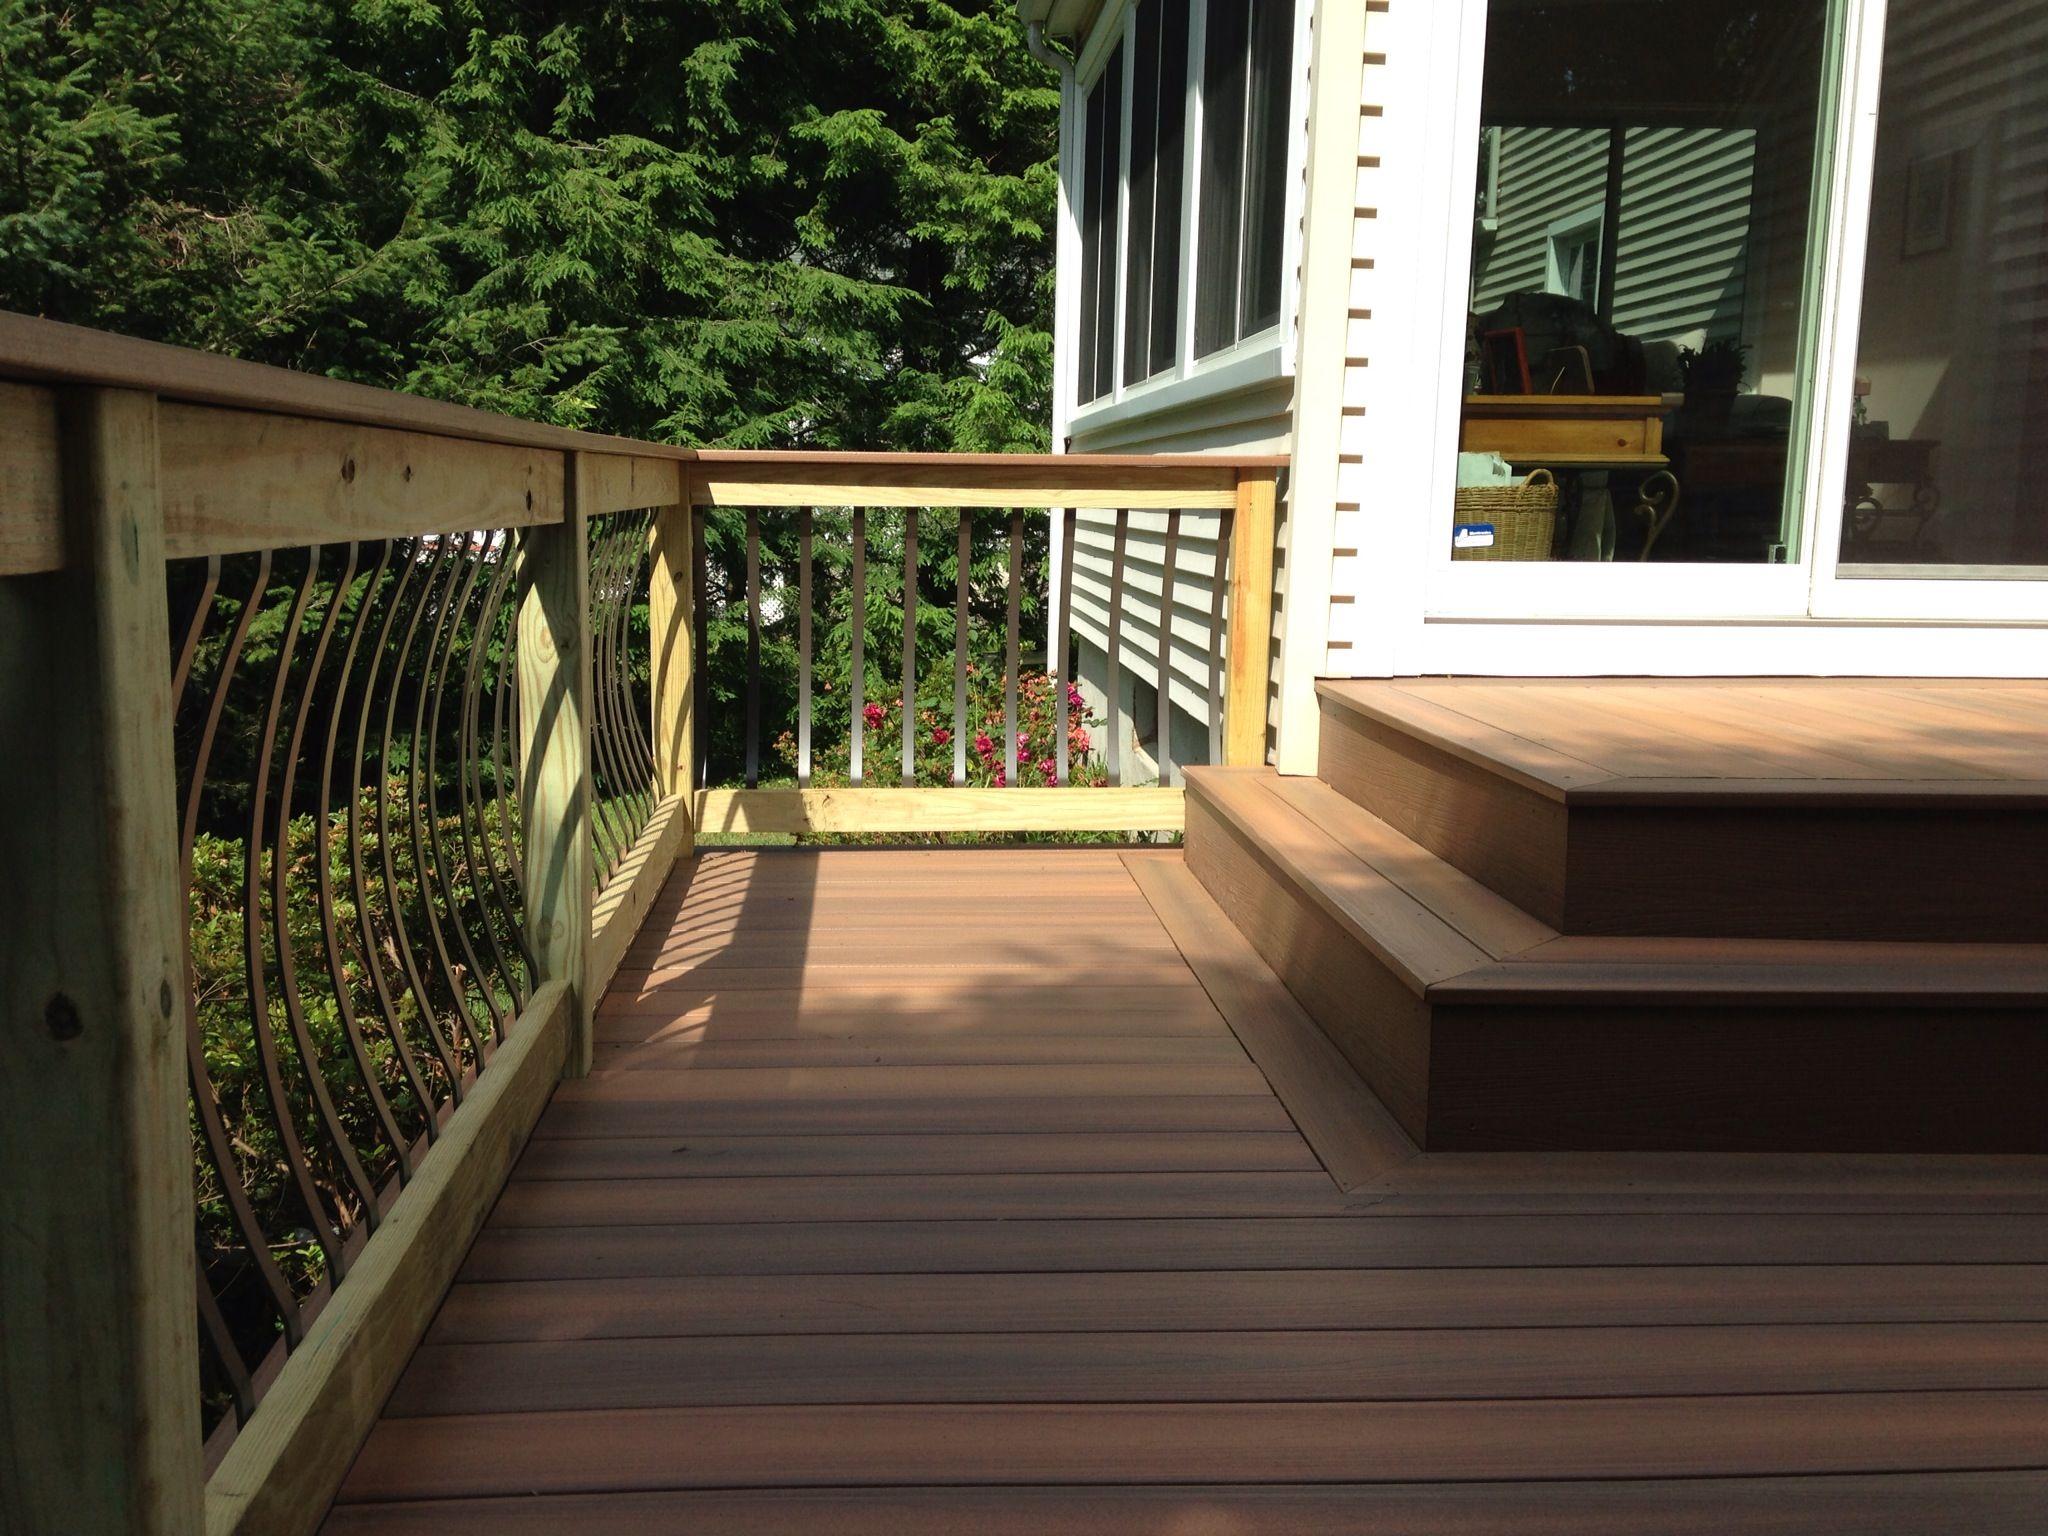 Deck Railing Aluminum Spindles